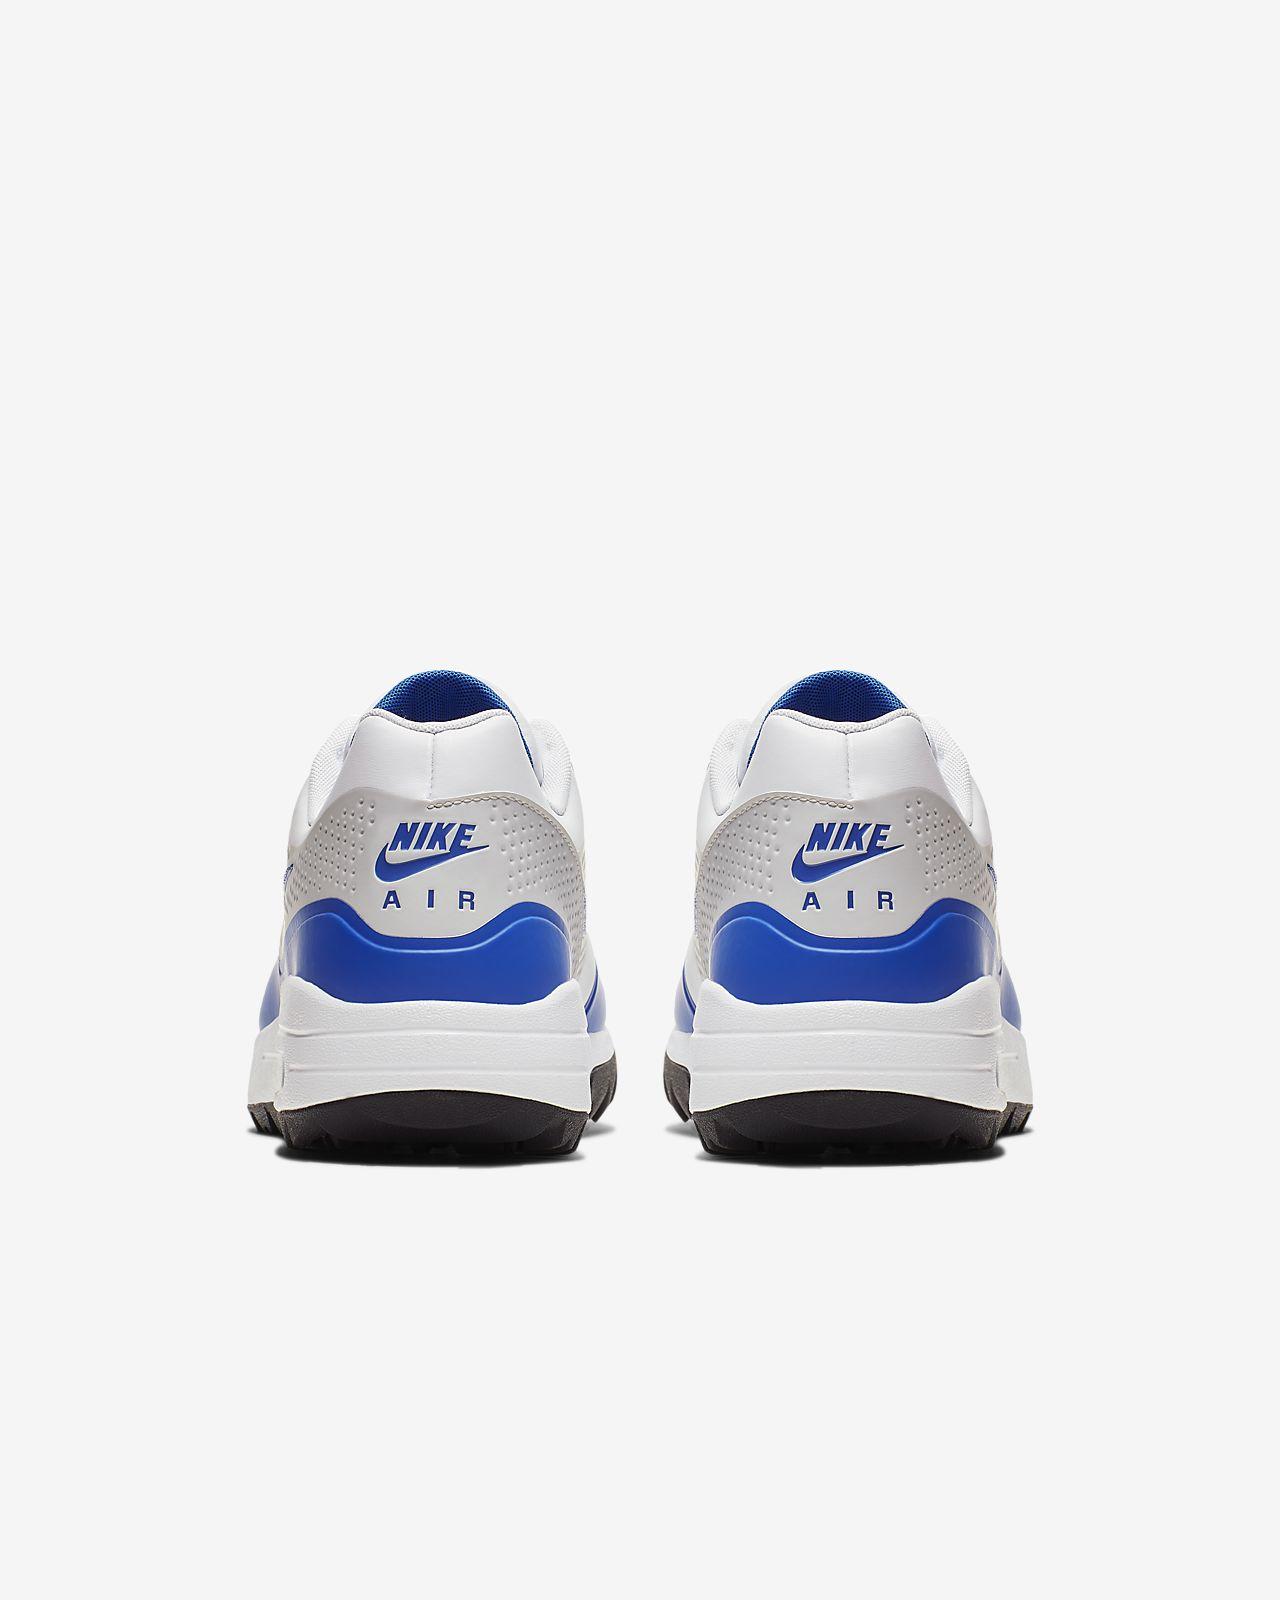 promo code 13419 fcd24 ... Nike Air Max 1 G Men s Golf Shoe